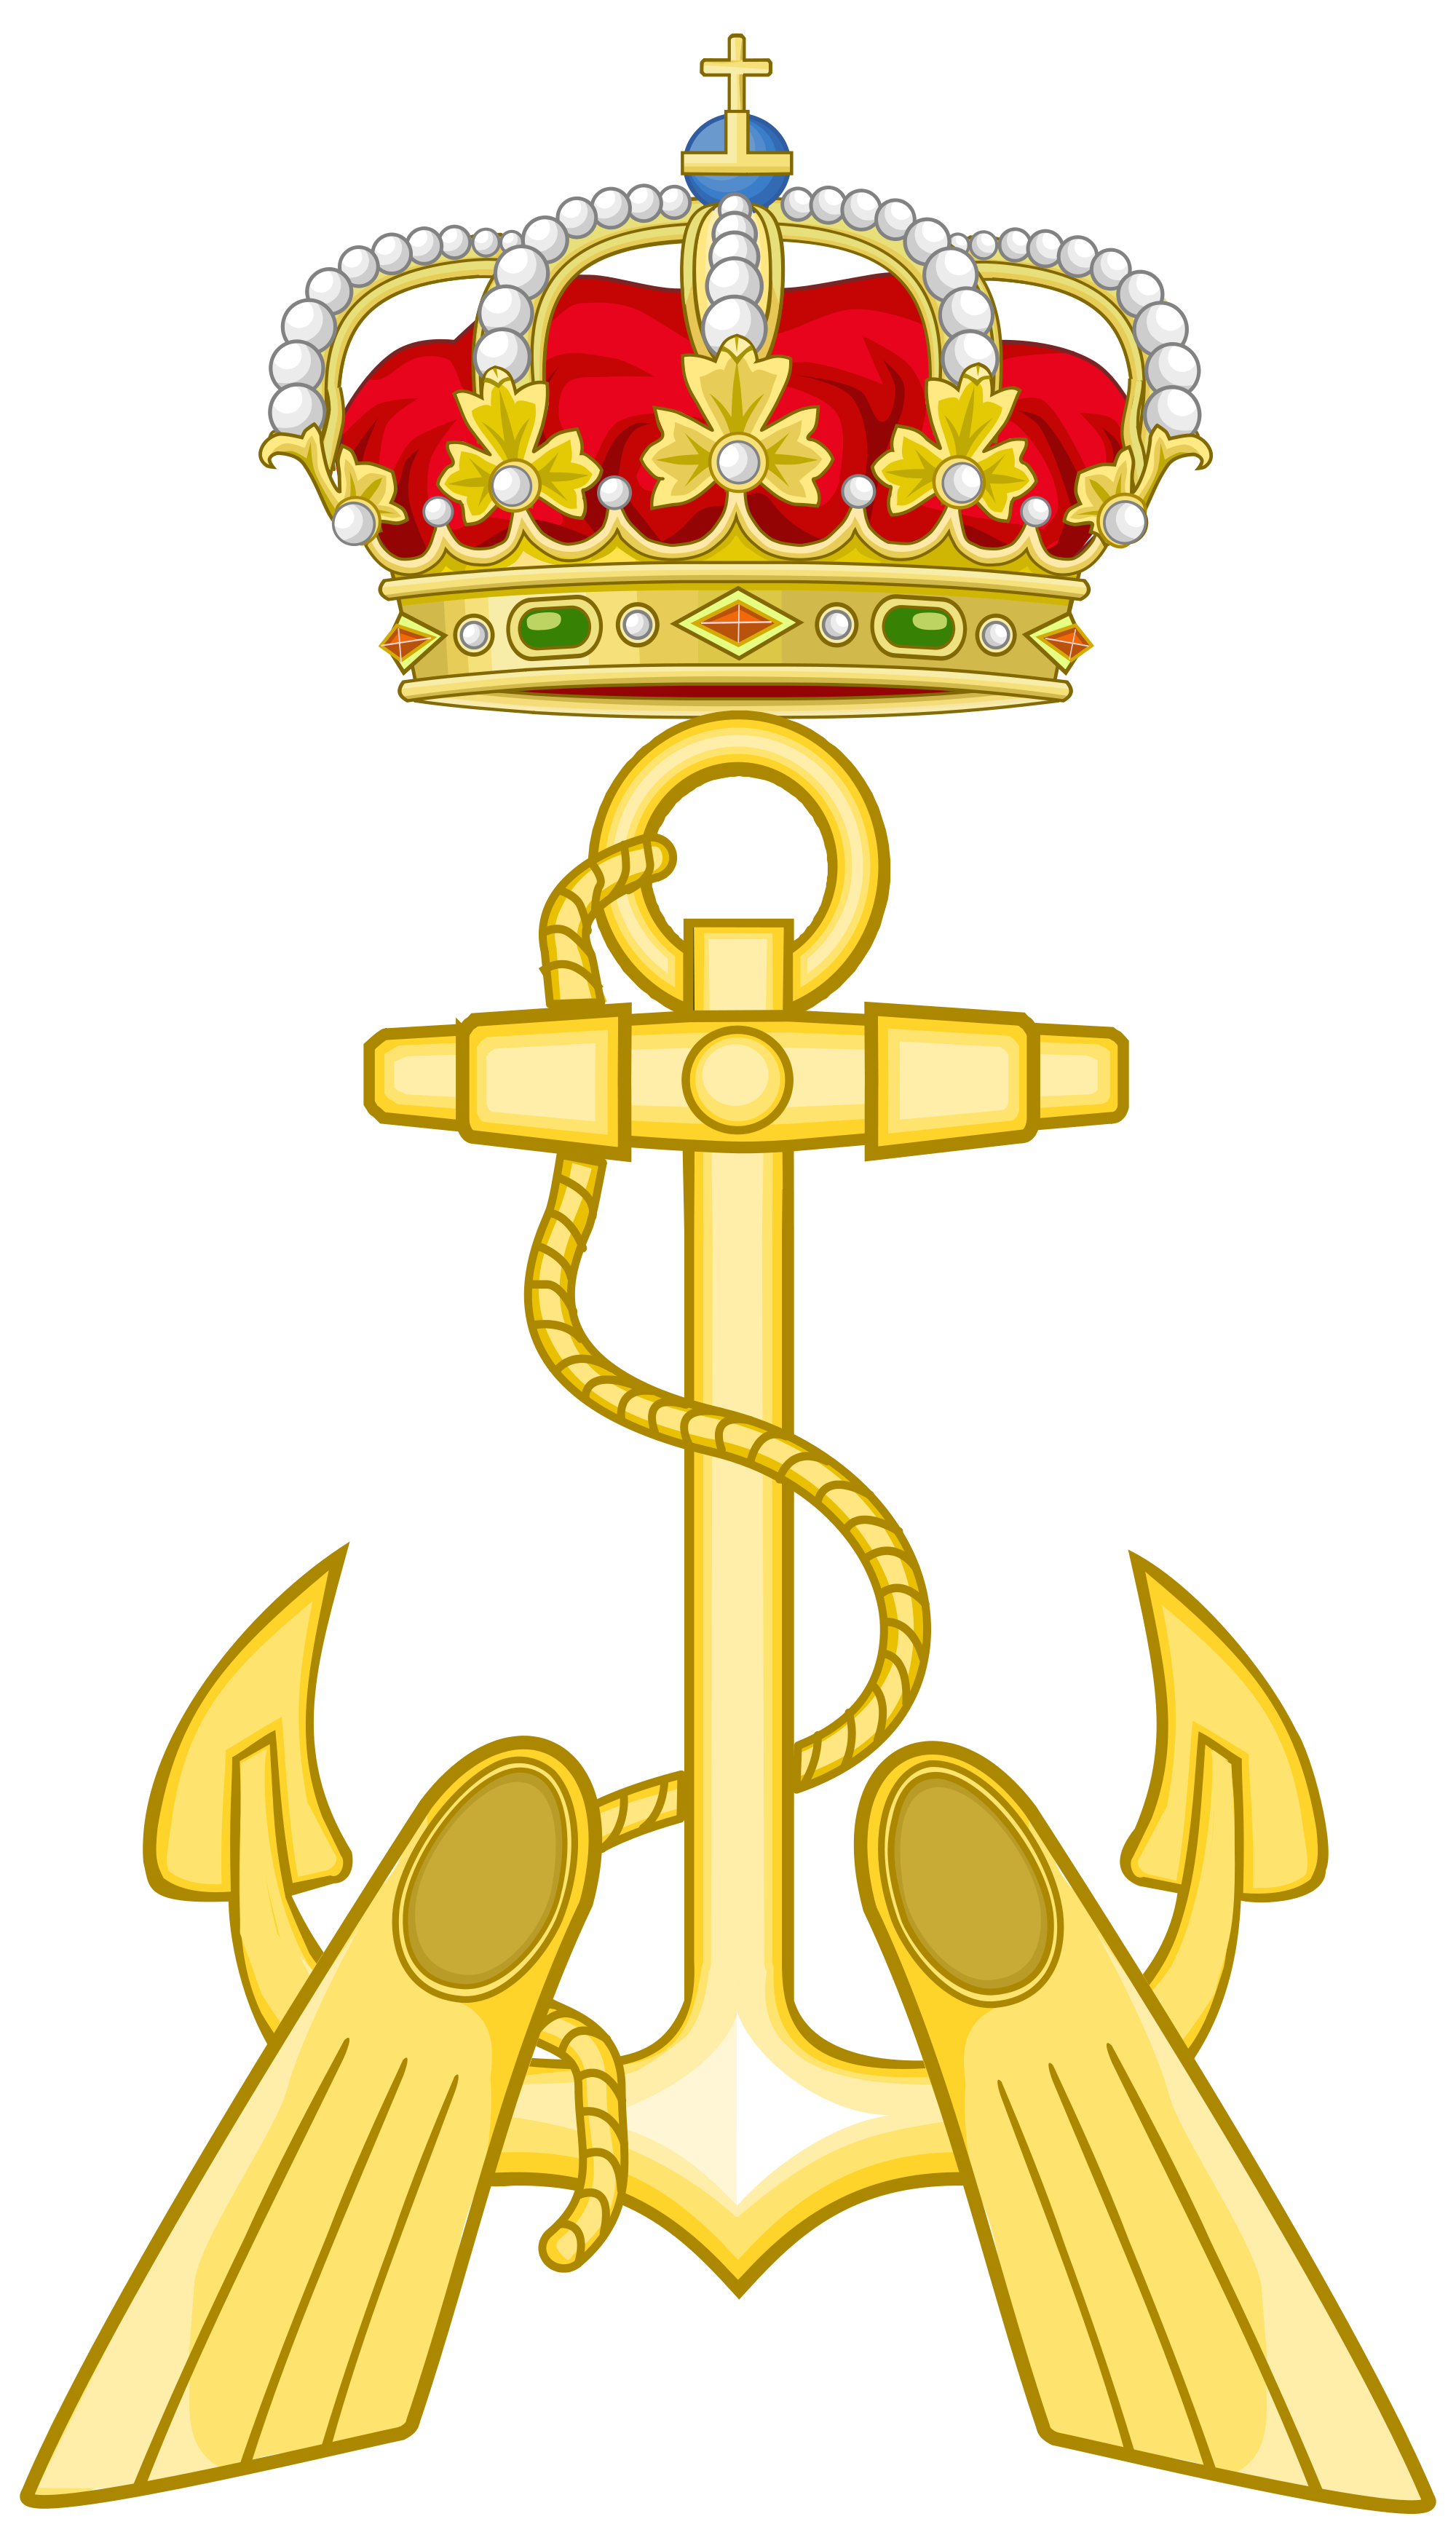 Diving clipart diver navy. File emblem of the